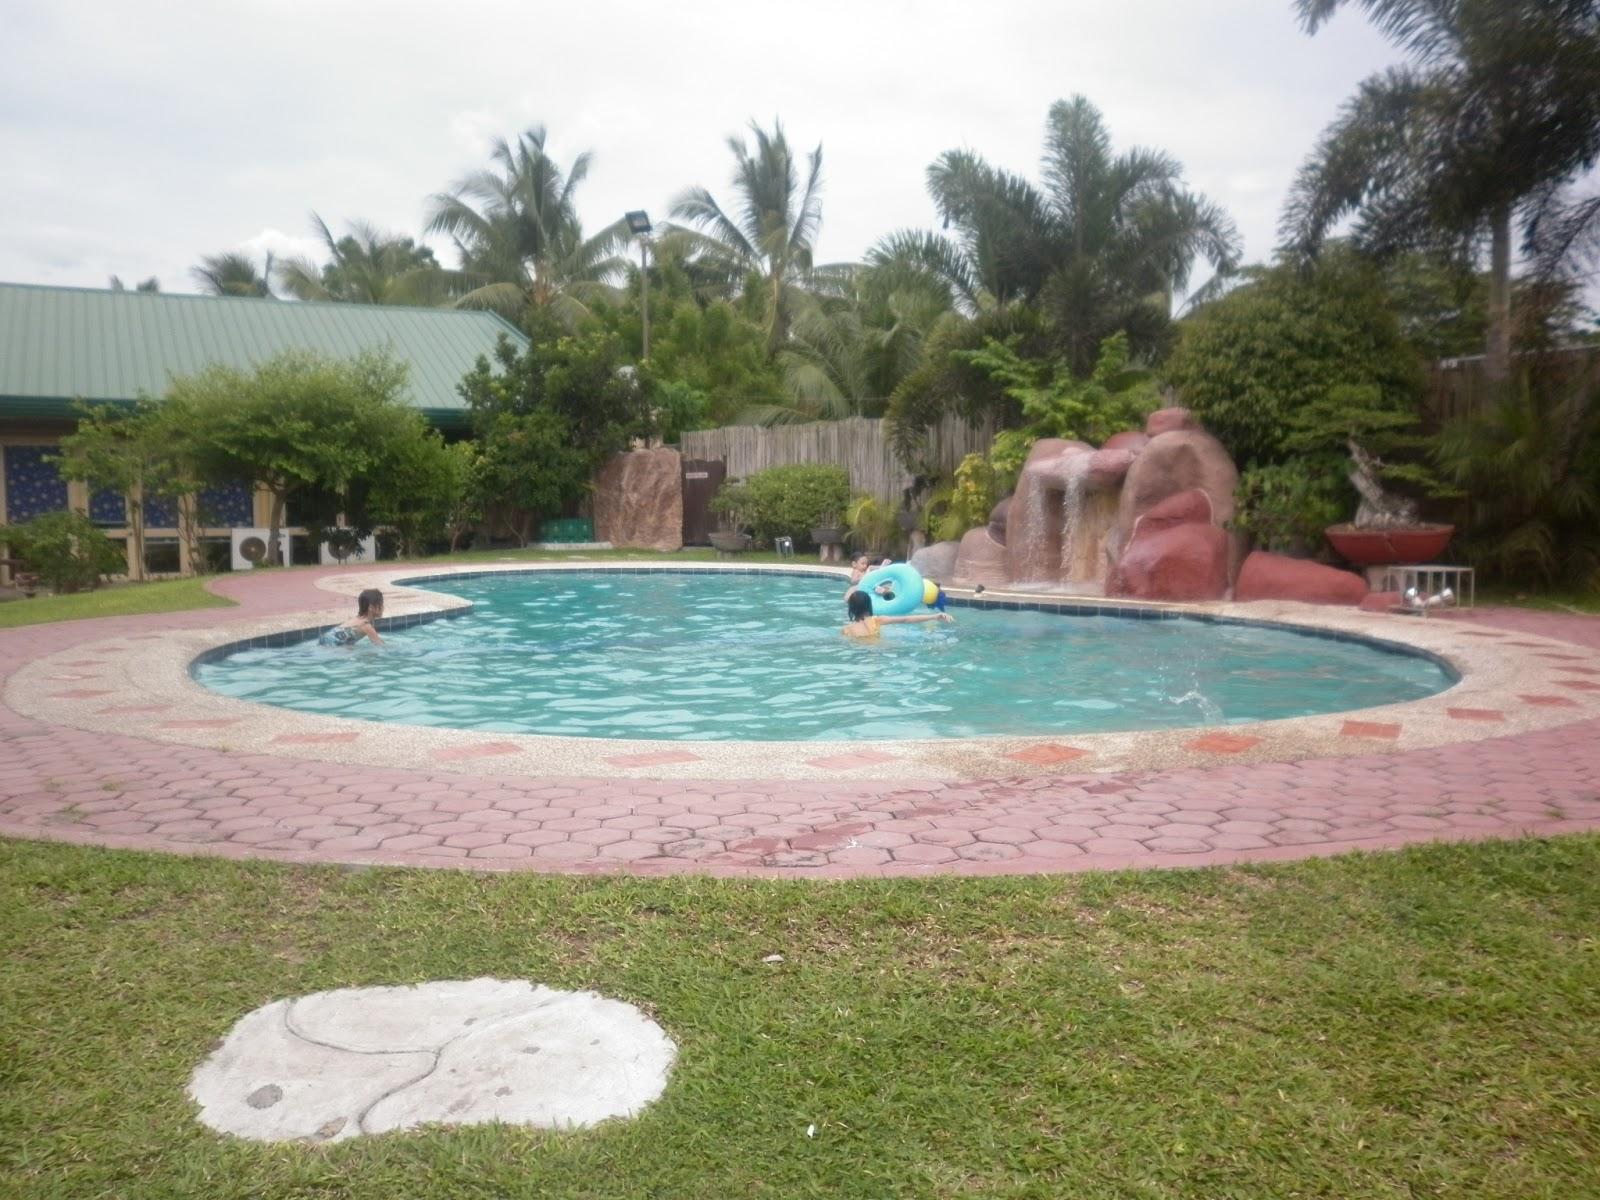 Travel And Leisure The Rock Garden General Santos City